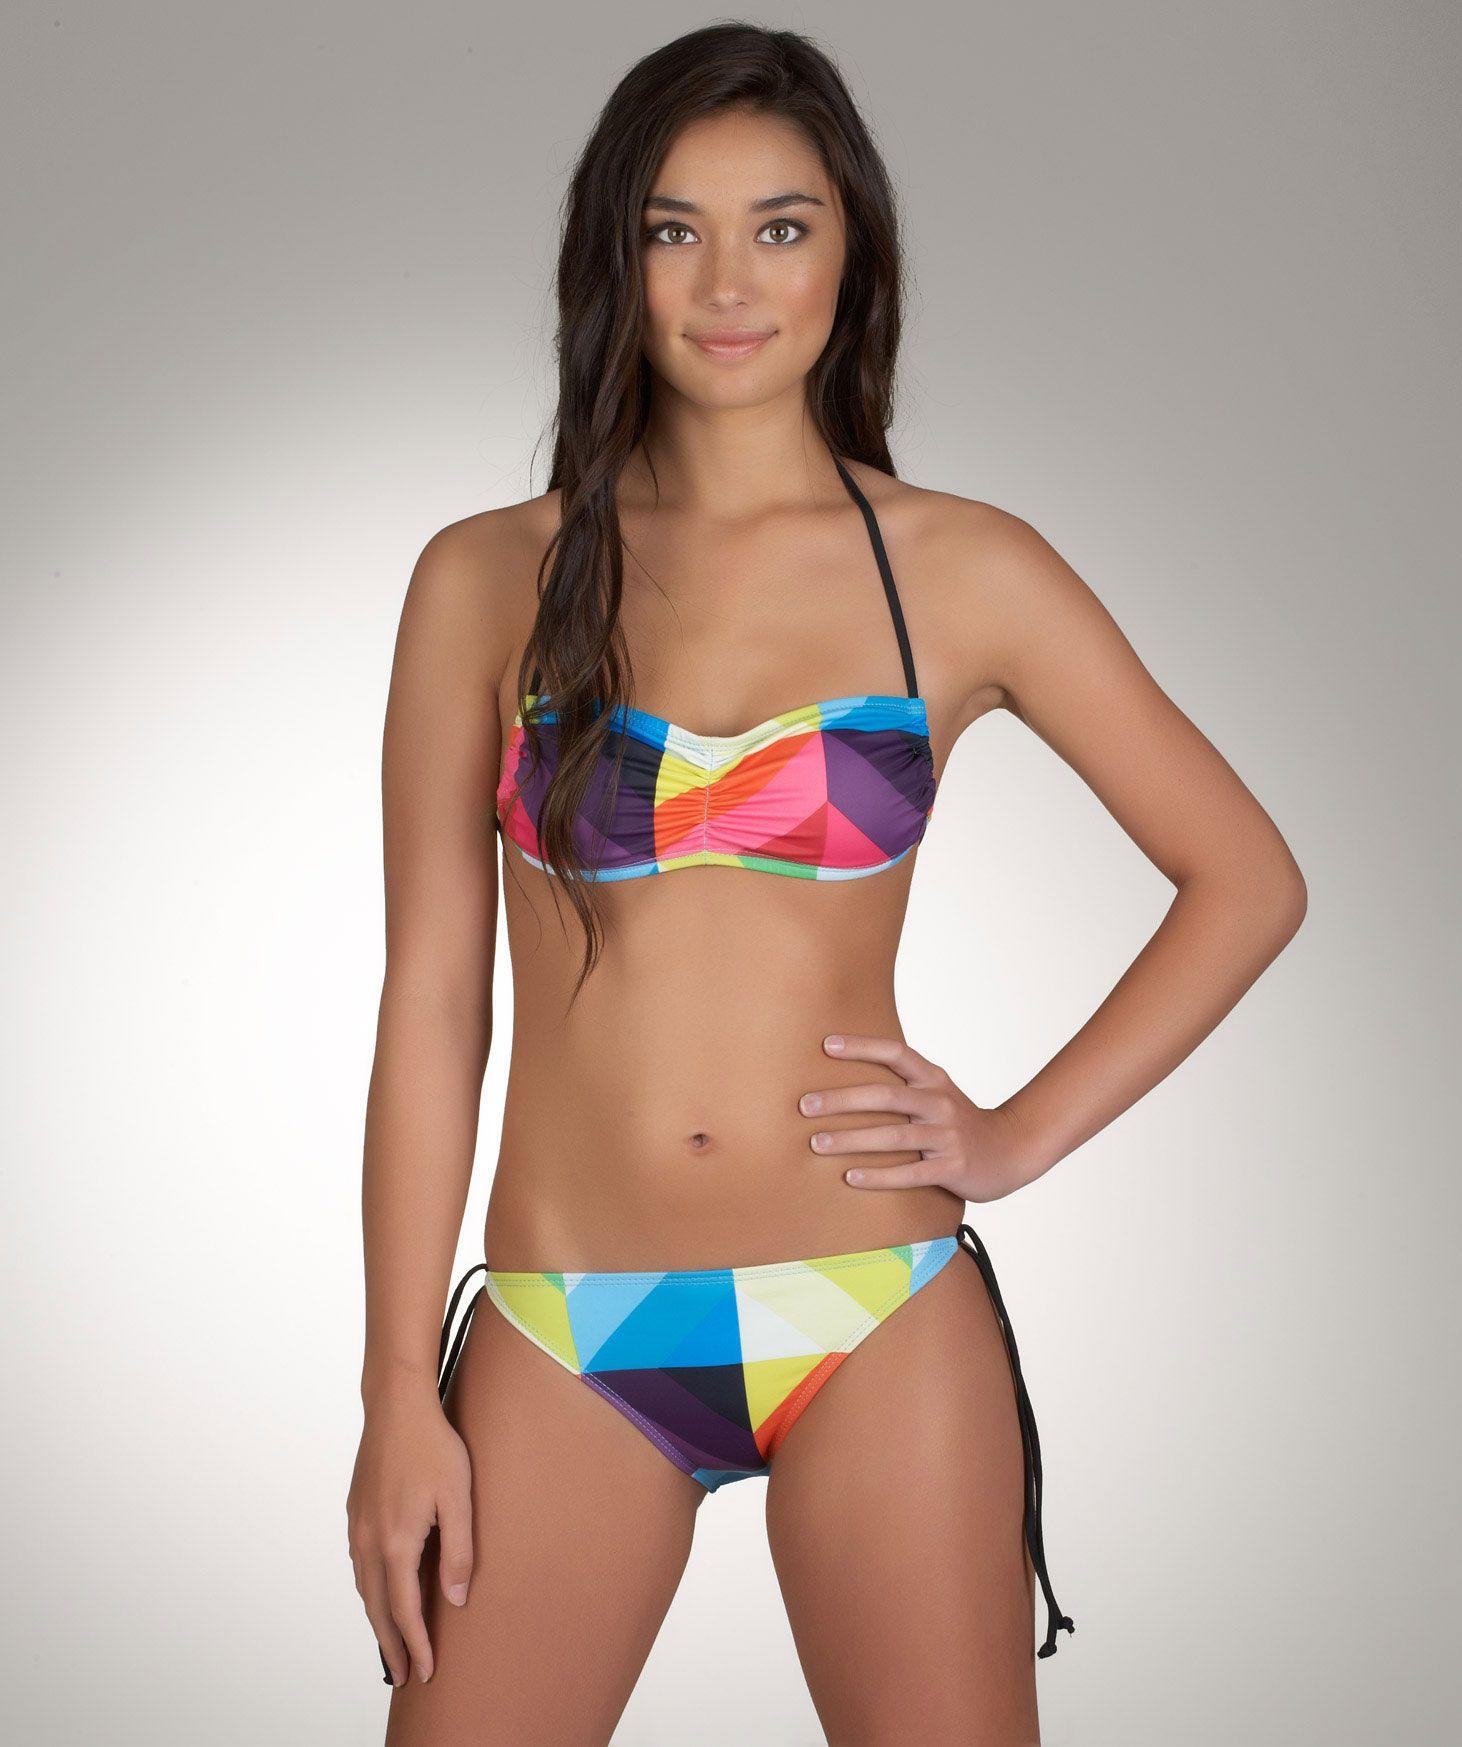 eeb602c90405b SwimSpot: Women's Swimwear   suits n' stuff   Bikinis, Swimwear ...